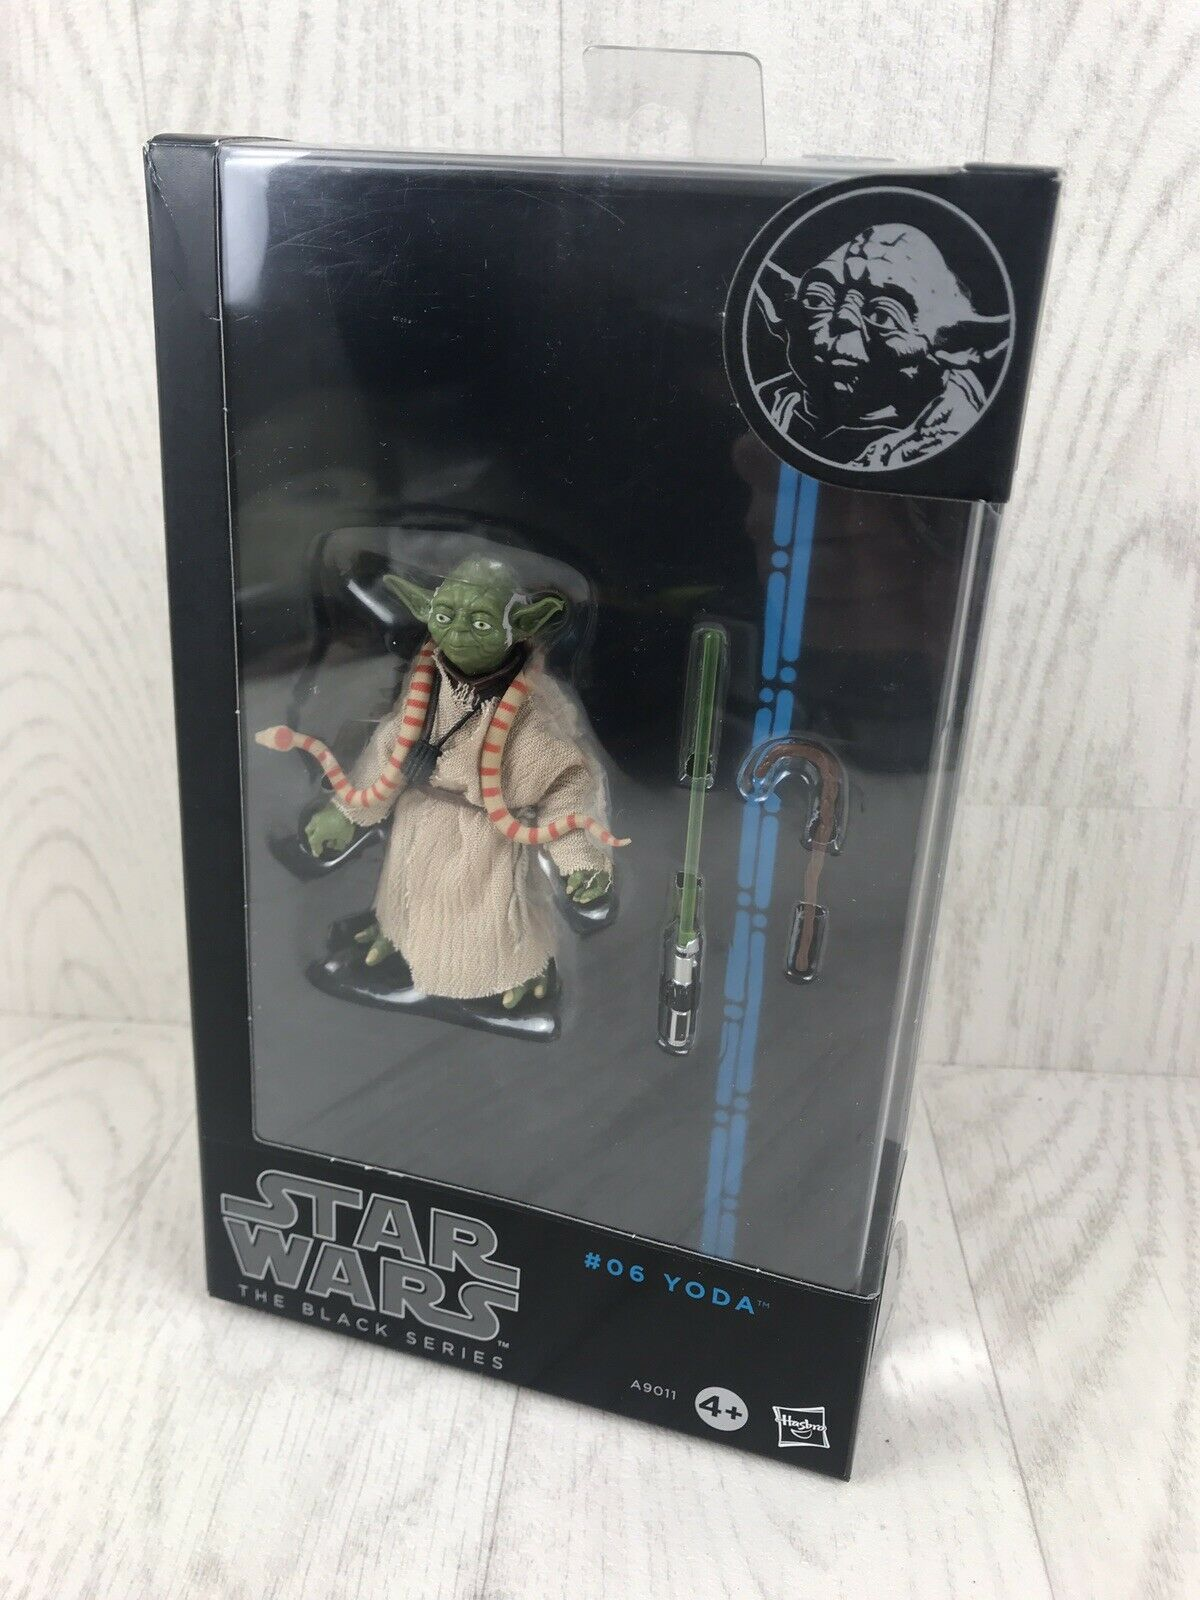 STAR Wars Nero Serie Yoda in Scatola () (Scala 6) mai stato aperto.